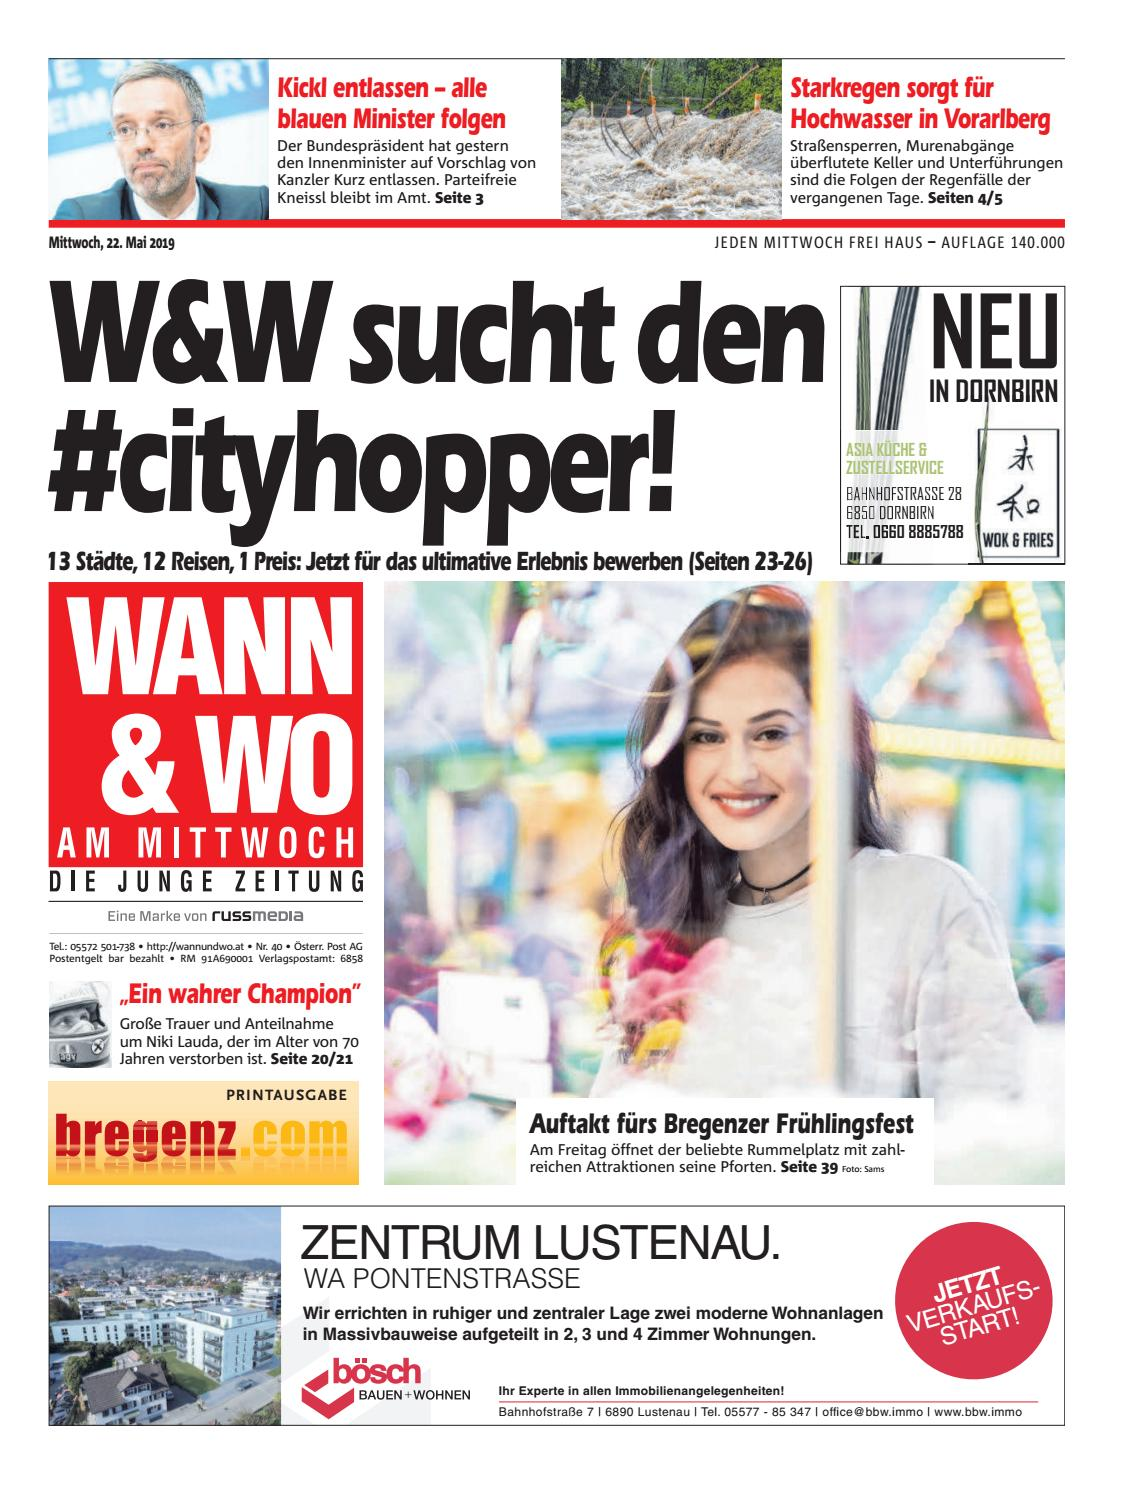 single in Bregenz - Bekanntschaften - Partnersuche